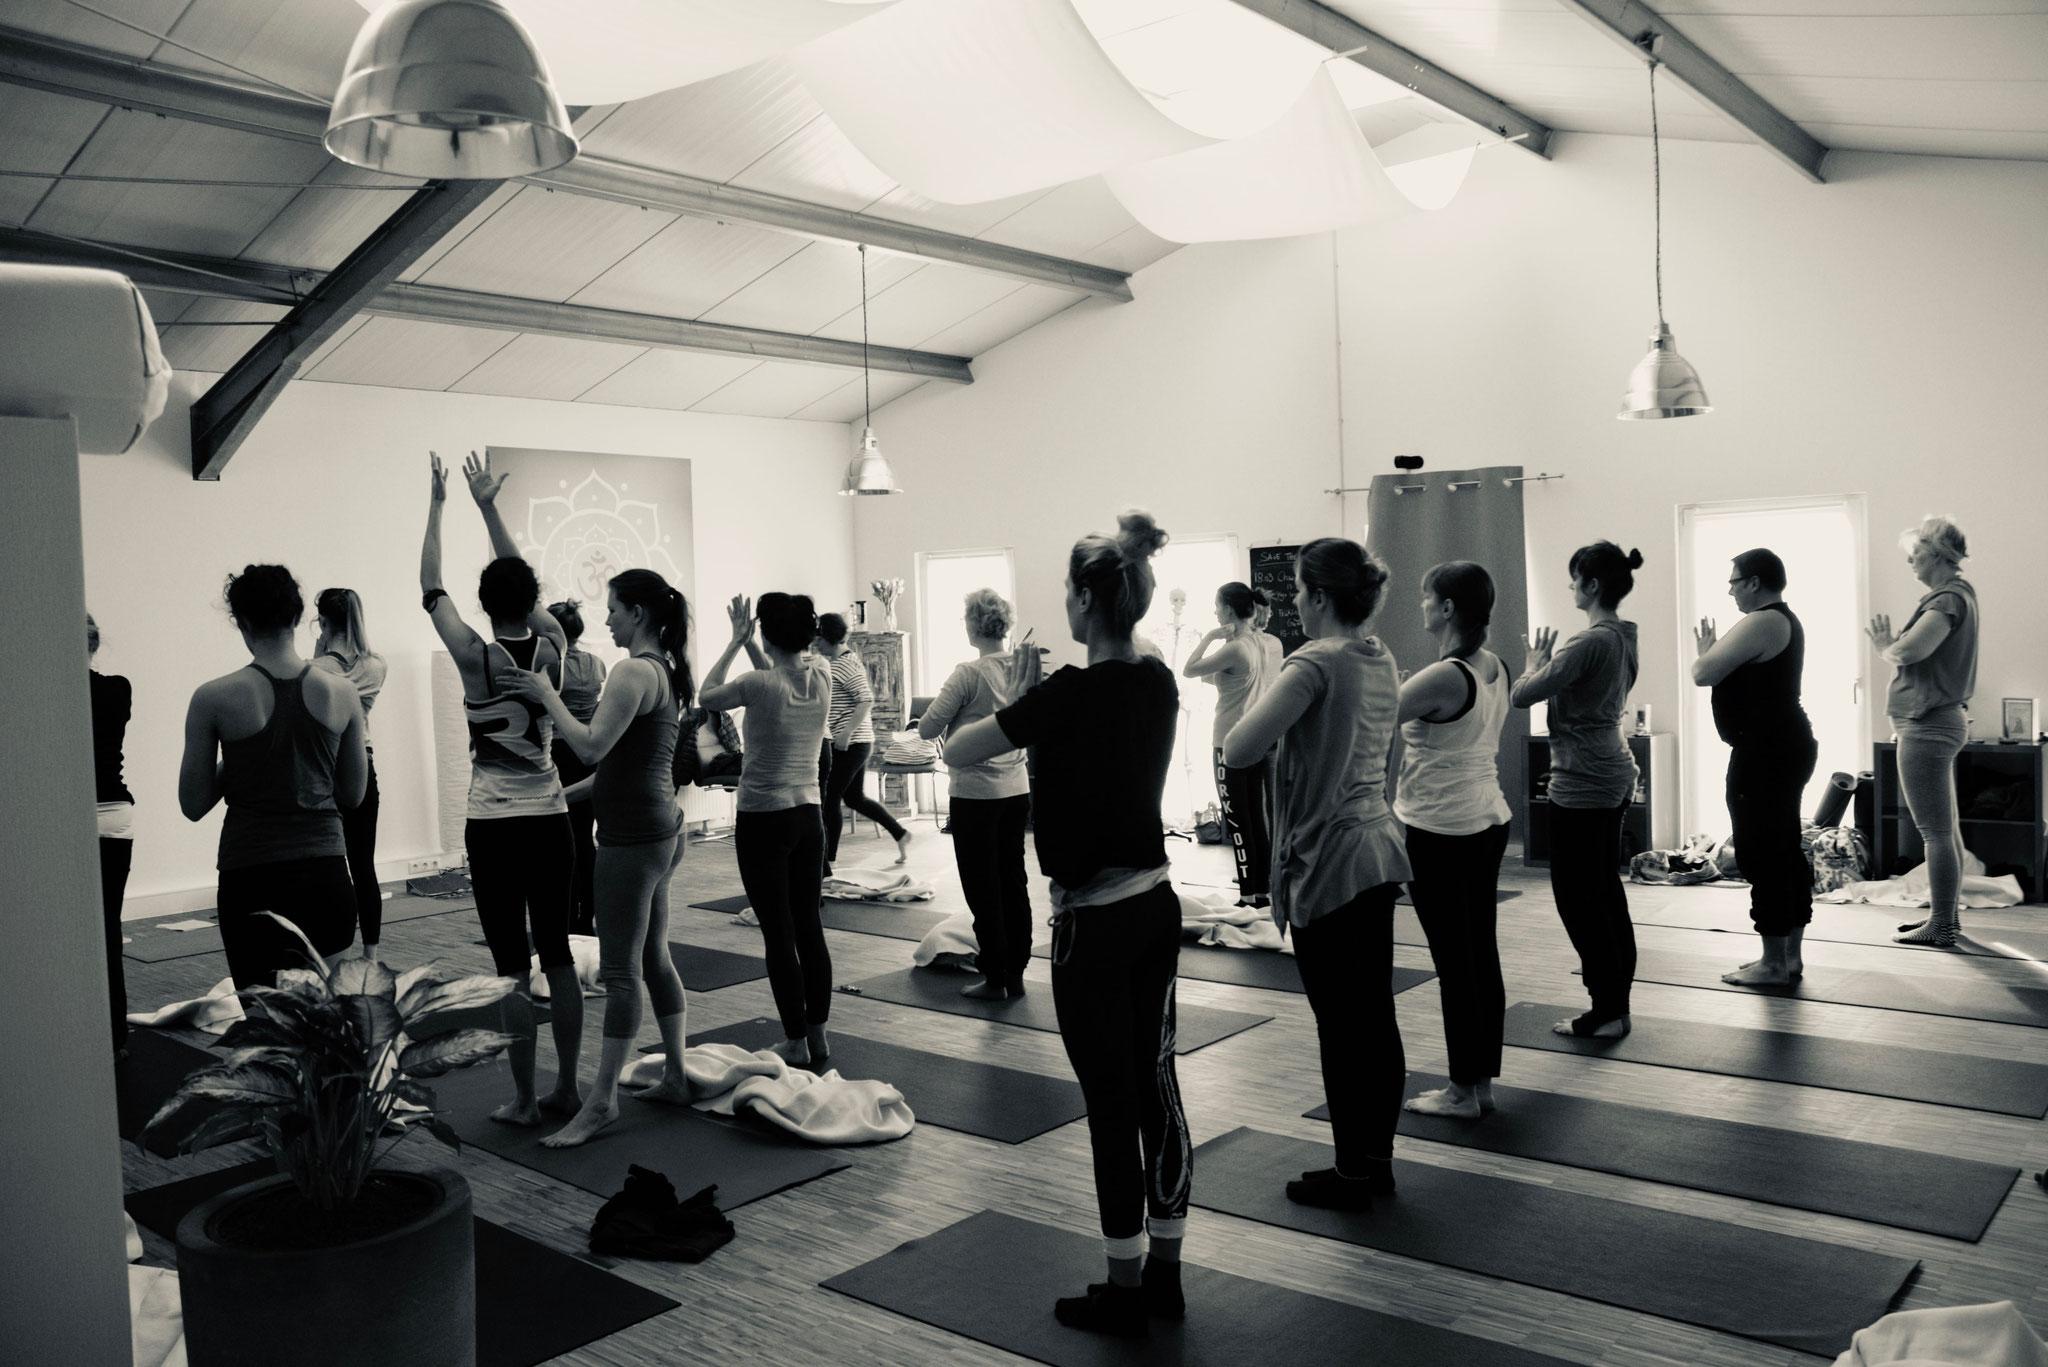 Hatha Yogakurs bei Yamida - Yogaschule Lüdinghausen Selm, Nordkirchen, Ascheberg, Cappenberg, Olfen, Senden